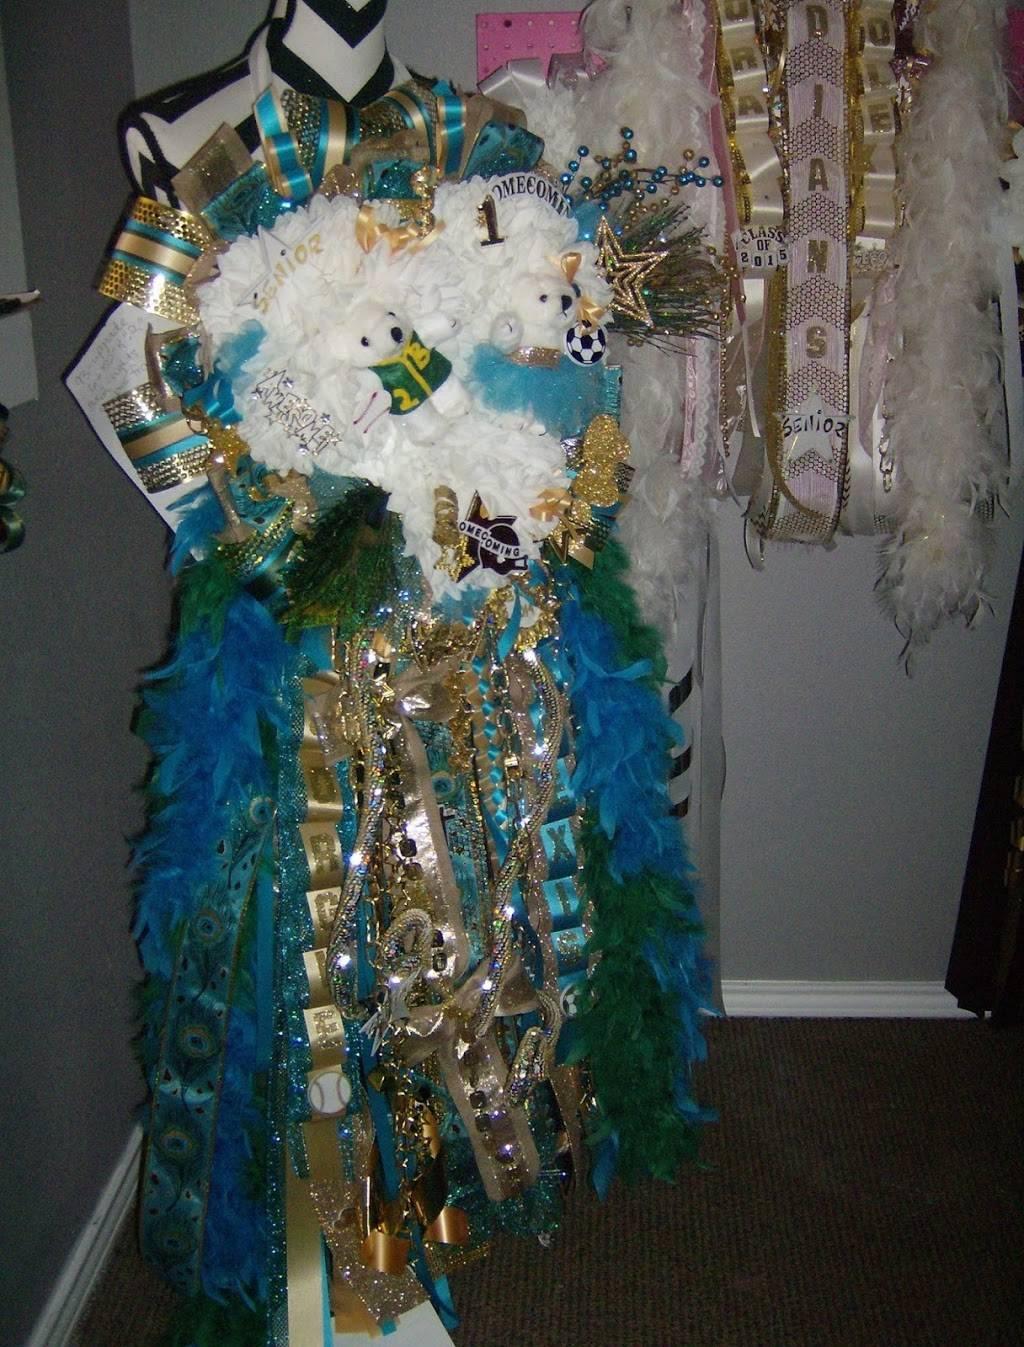 Spotlight Homecoming Mums - store  | Photo 7 of 7 | Address: 10381 Alta Vista Rd #129, Fort Worth, TX 76244, USA | Phone: (940) 389-8852